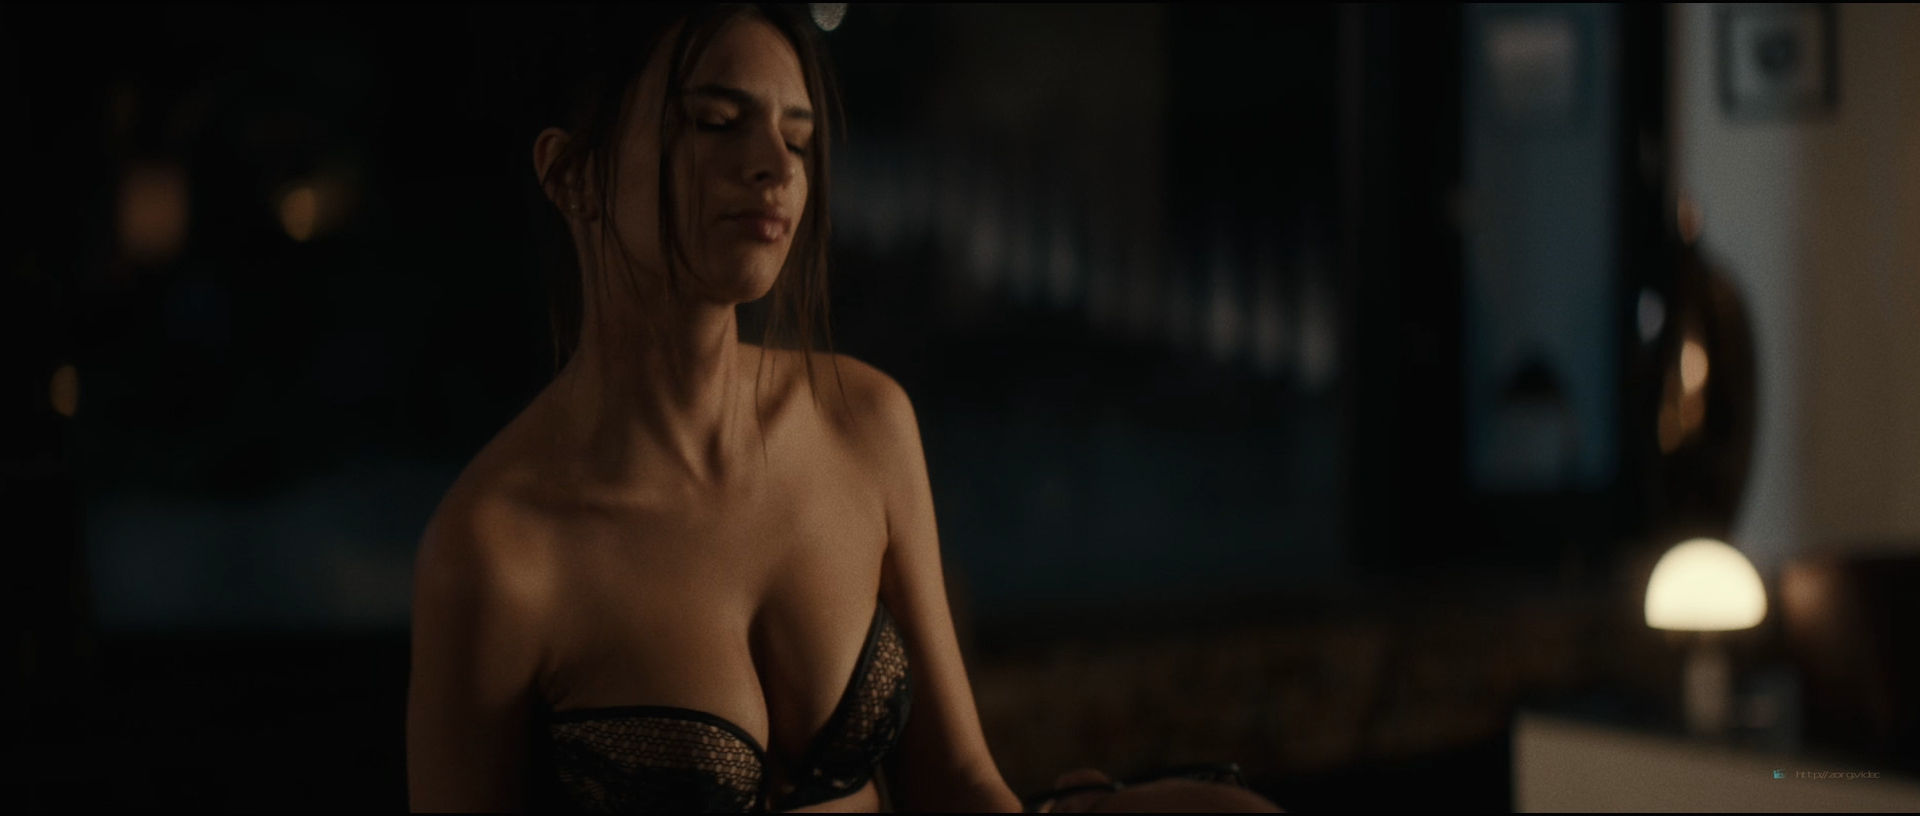 Emily Ratajkowski hot sideboob - Lying and Stealing (2019) 1080p WEB (3)